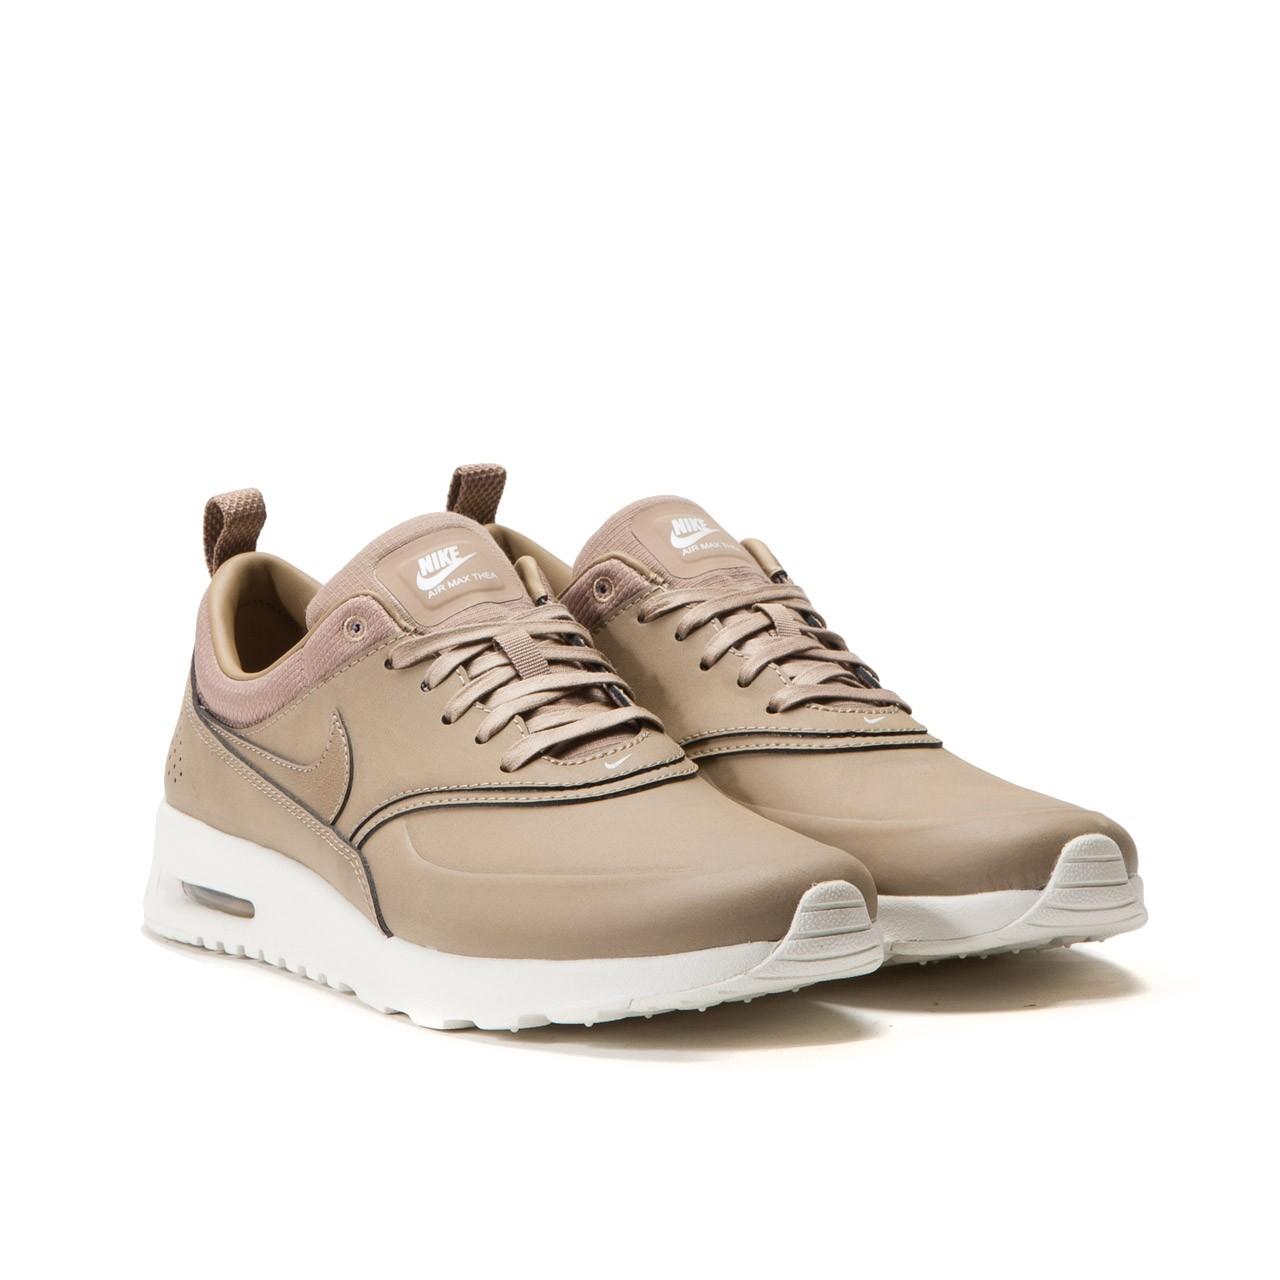 Air Max PRMDesert Nike Wmns Thea Camo 4jL3RAcq5